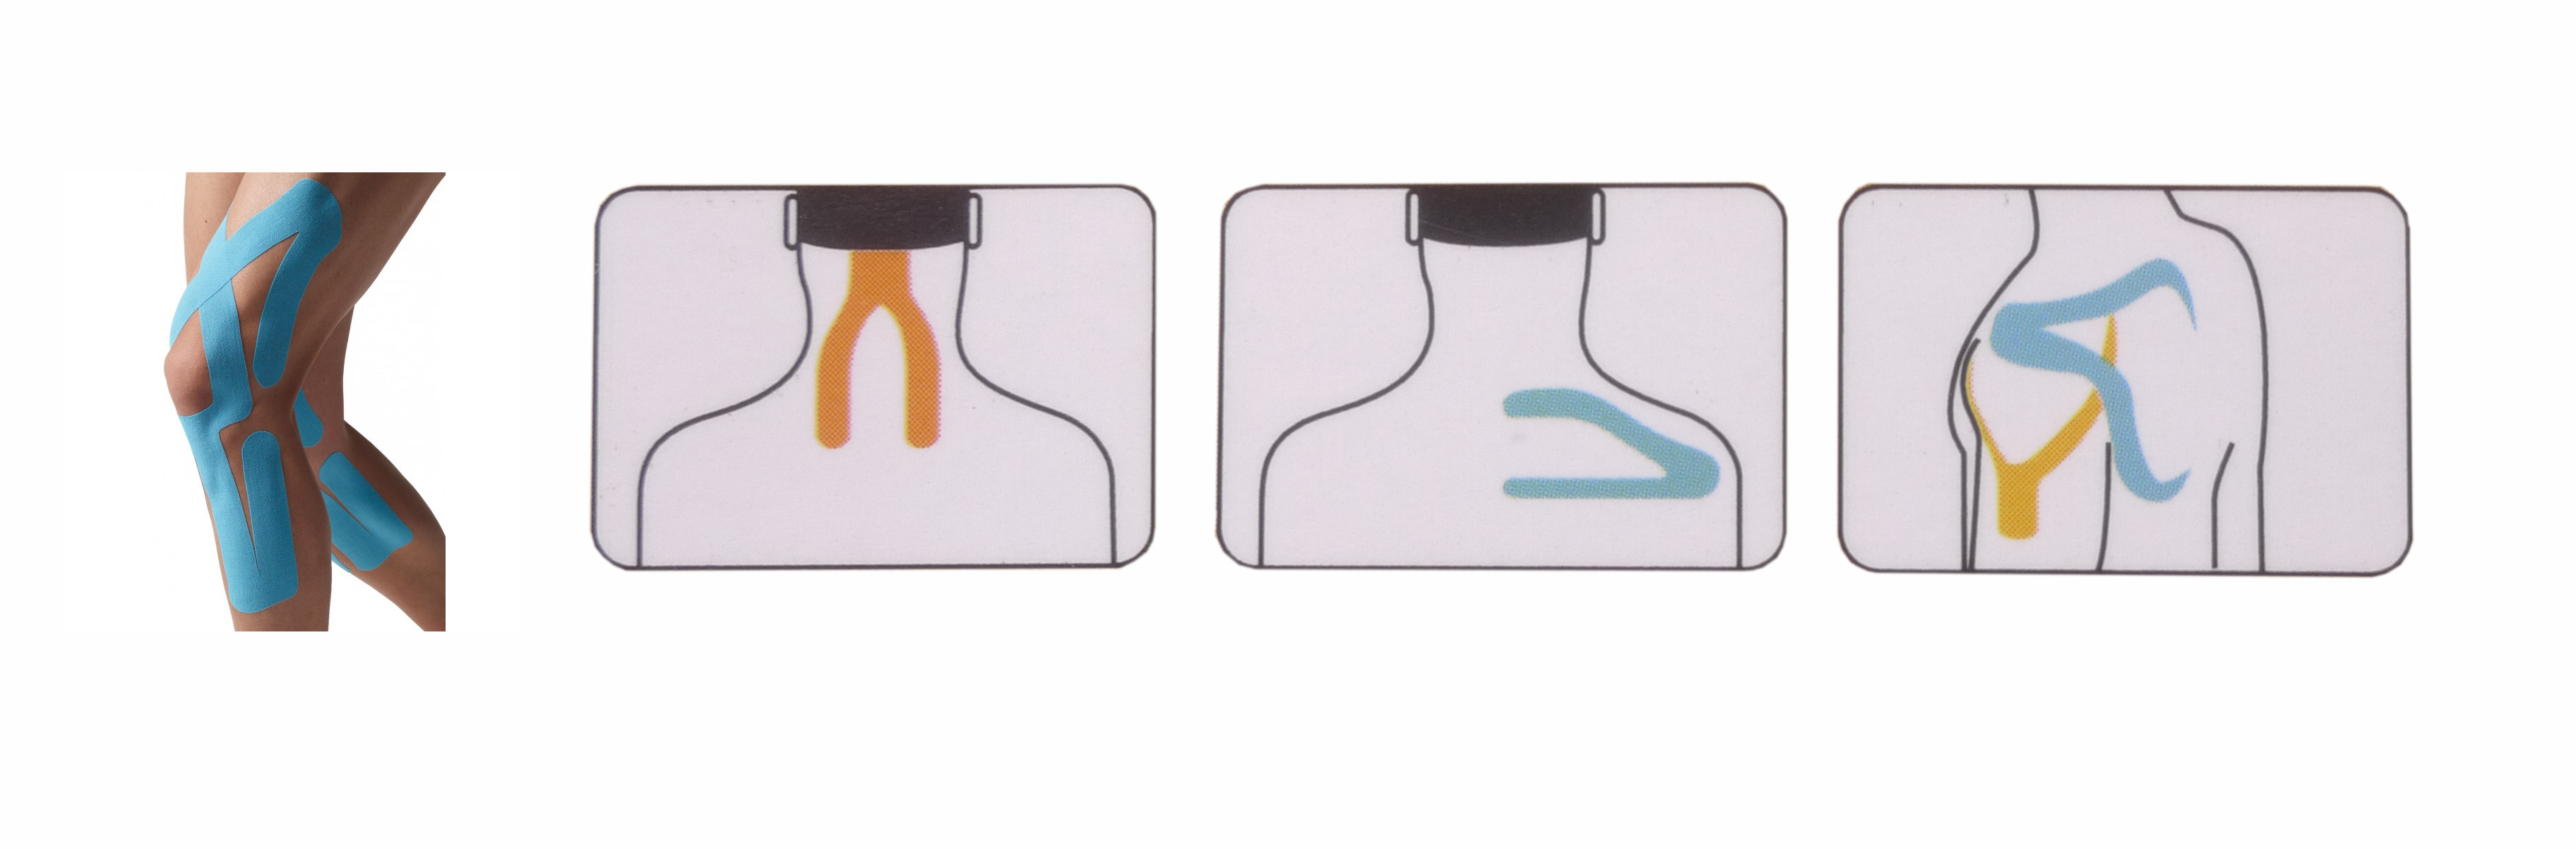 Apacs Pre-cut Y Shape Kinesio Elastic Tape Therapeutic for ...